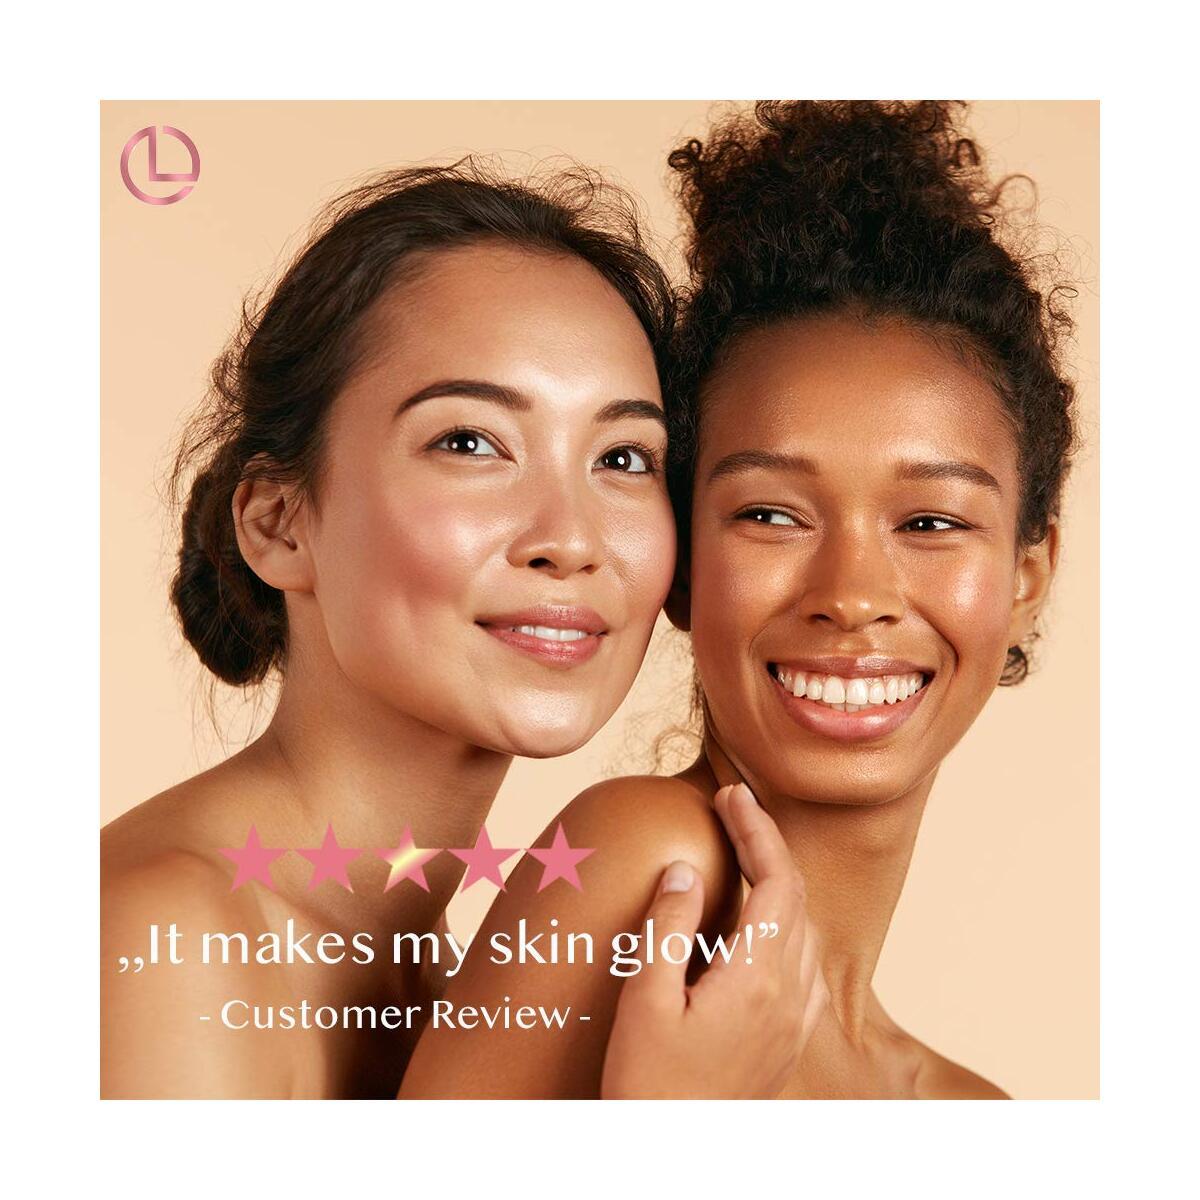 Face Cream with Vitamin C Serum Skin Care Hyaluronic Acid Natural Moisturizer Organic Facial Dark Spot Remover Night Cream Pore Minimizer Brightening Anti Aging Lotion Corrector Scar Removal